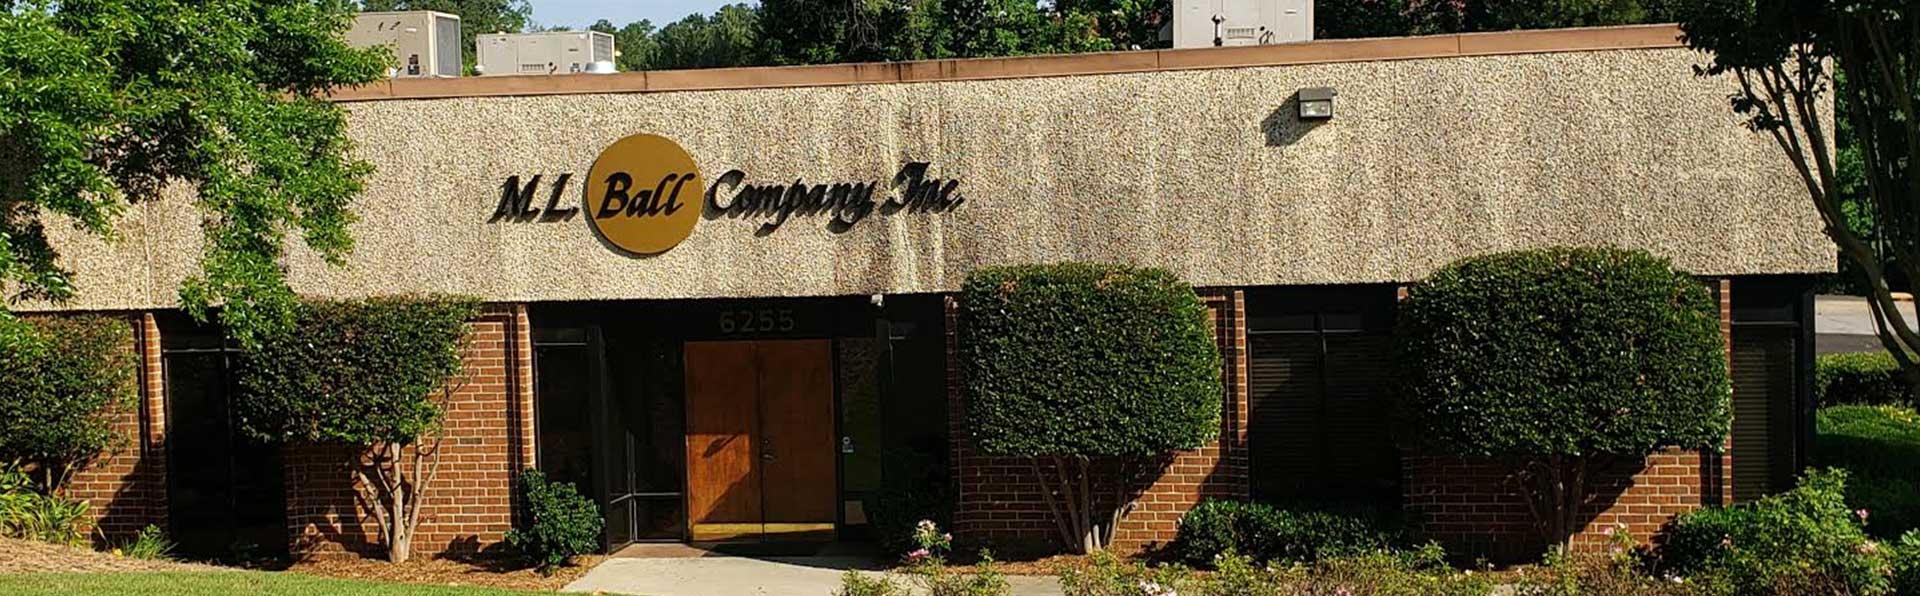 About M.L. Ball Company, Inc.